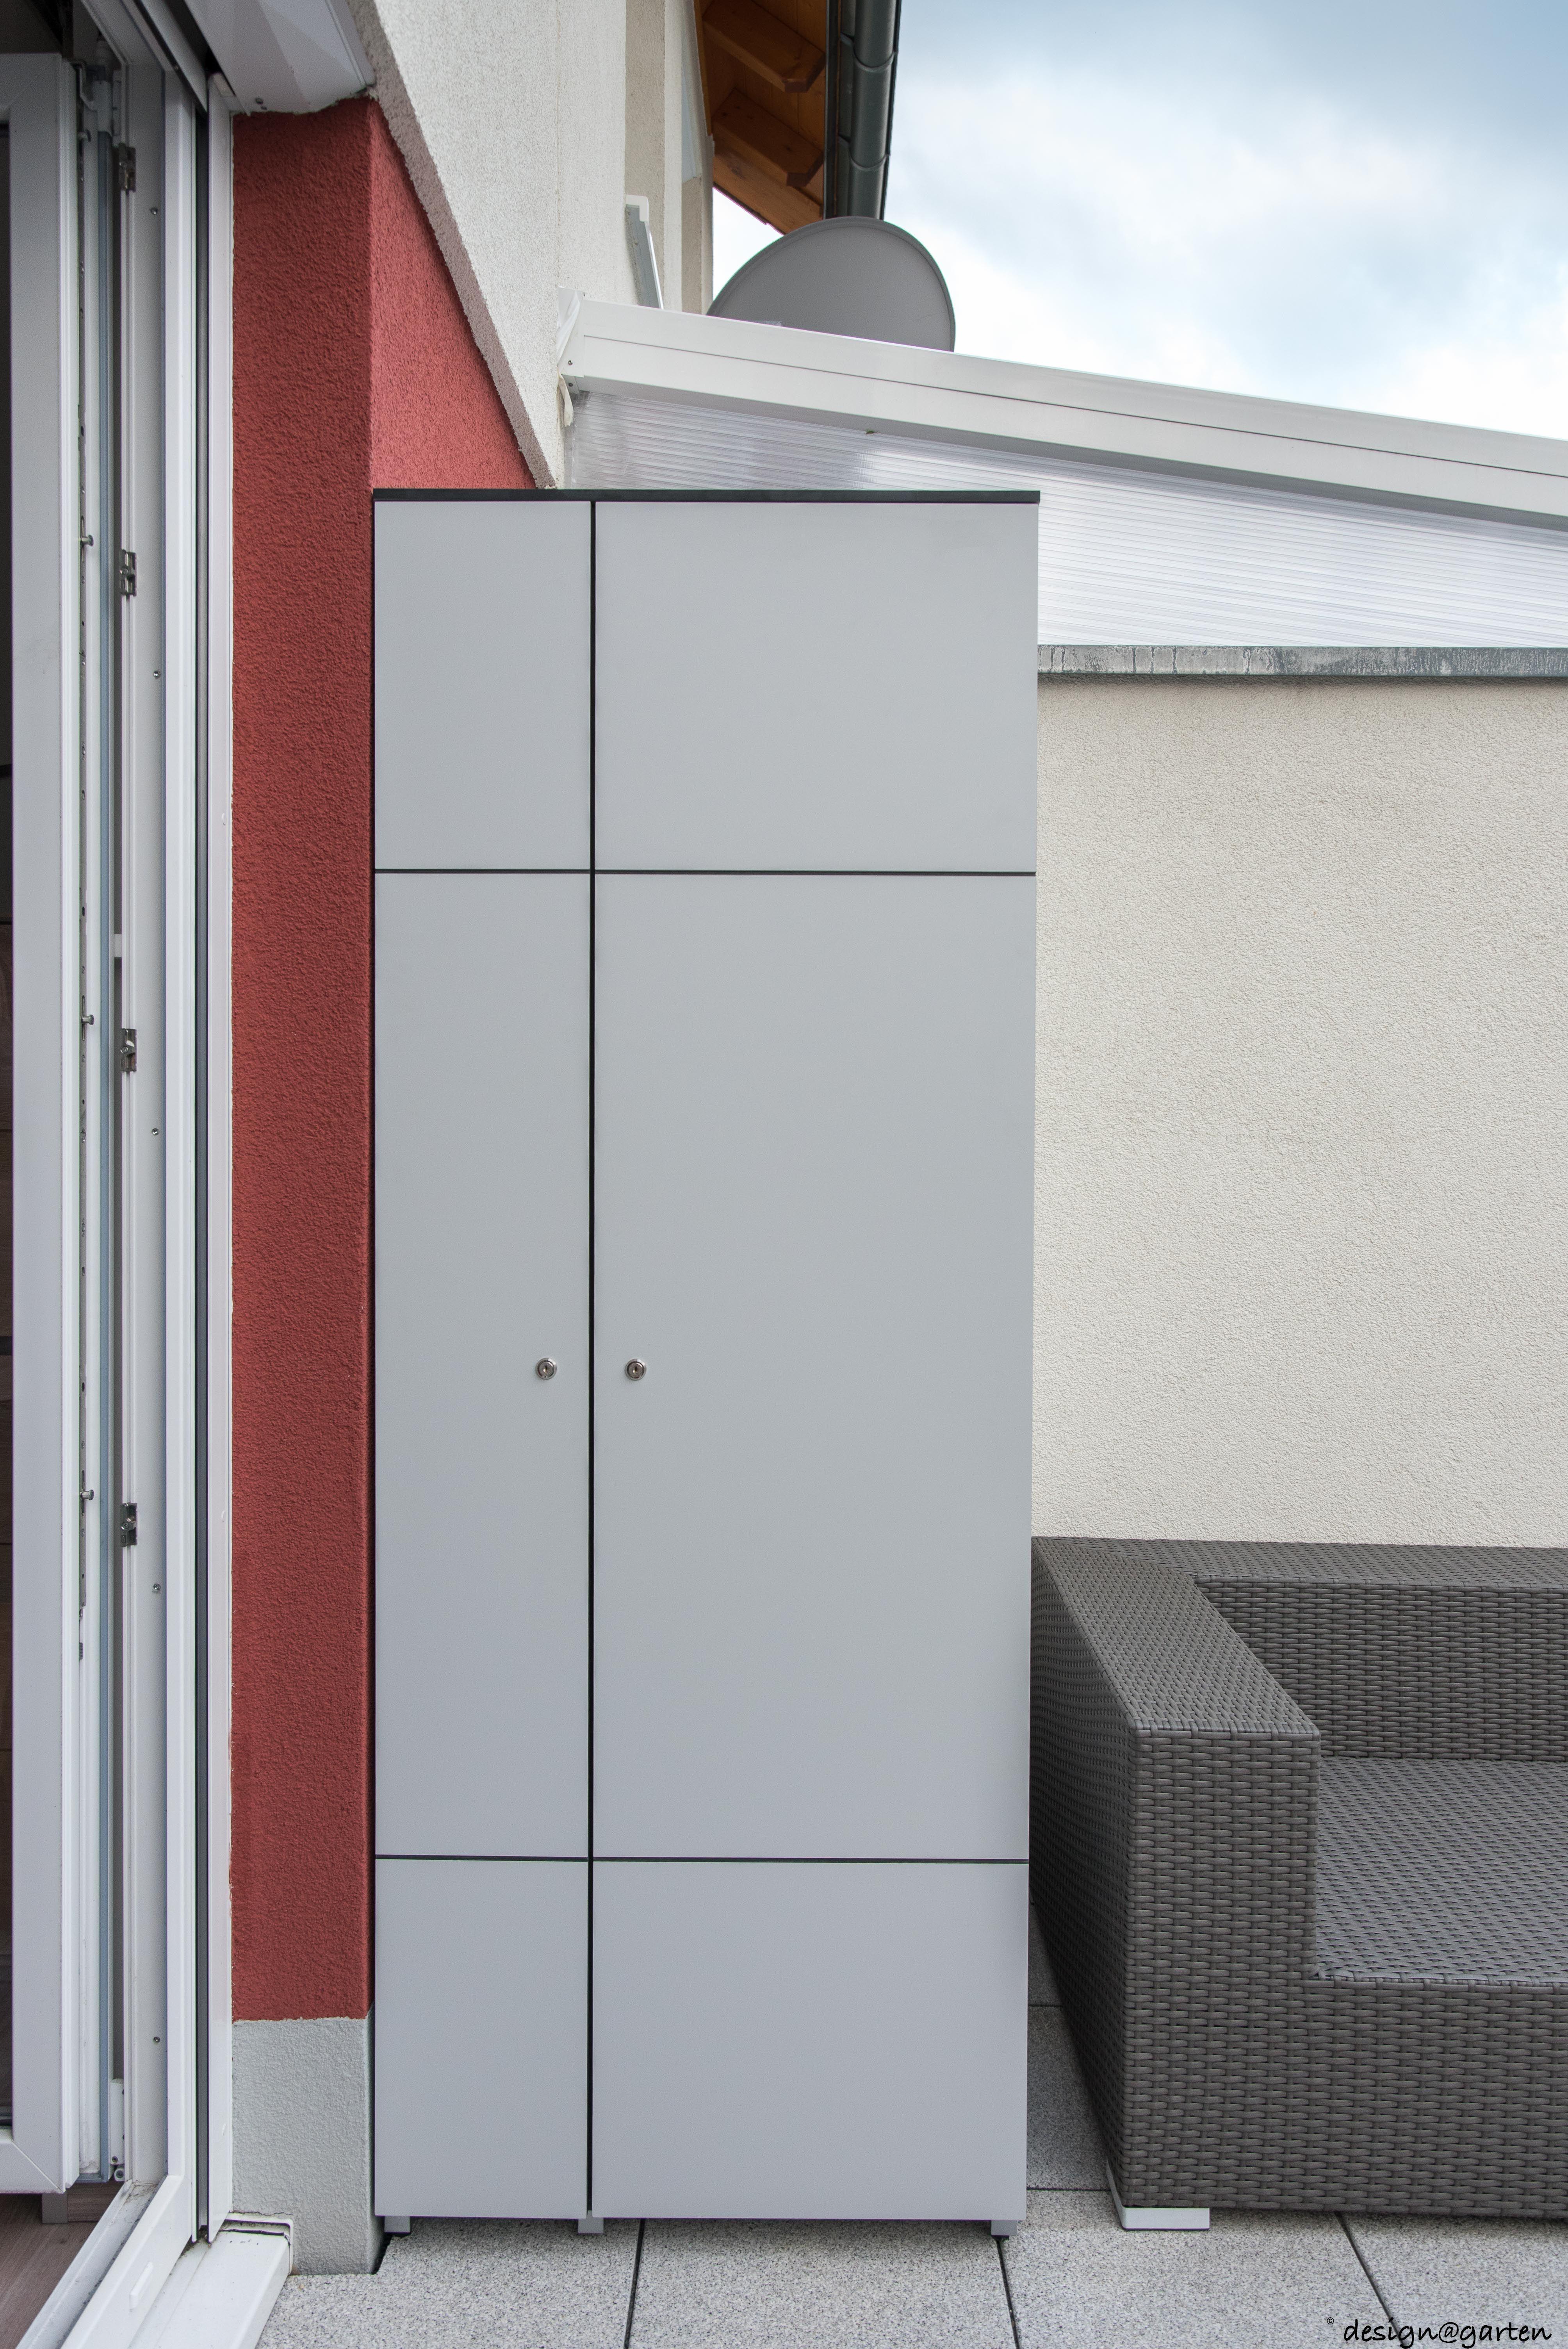 Balkonschrank Wetterfest balkonschrank win in bonn by design garten augsburg silvergrey